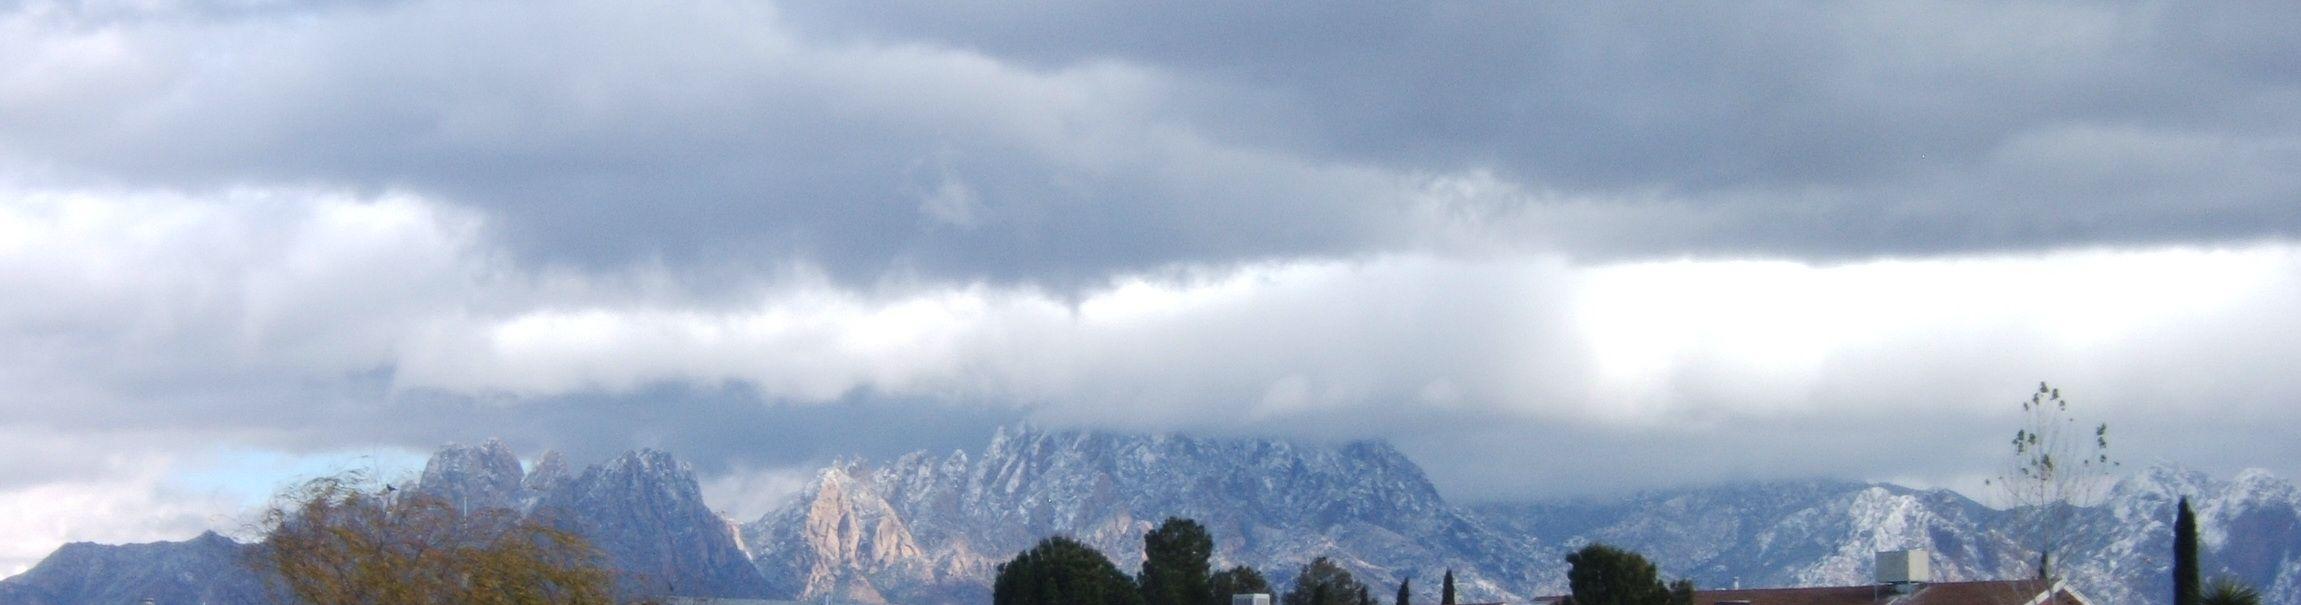 First Snow on Organ Peaks 12/08